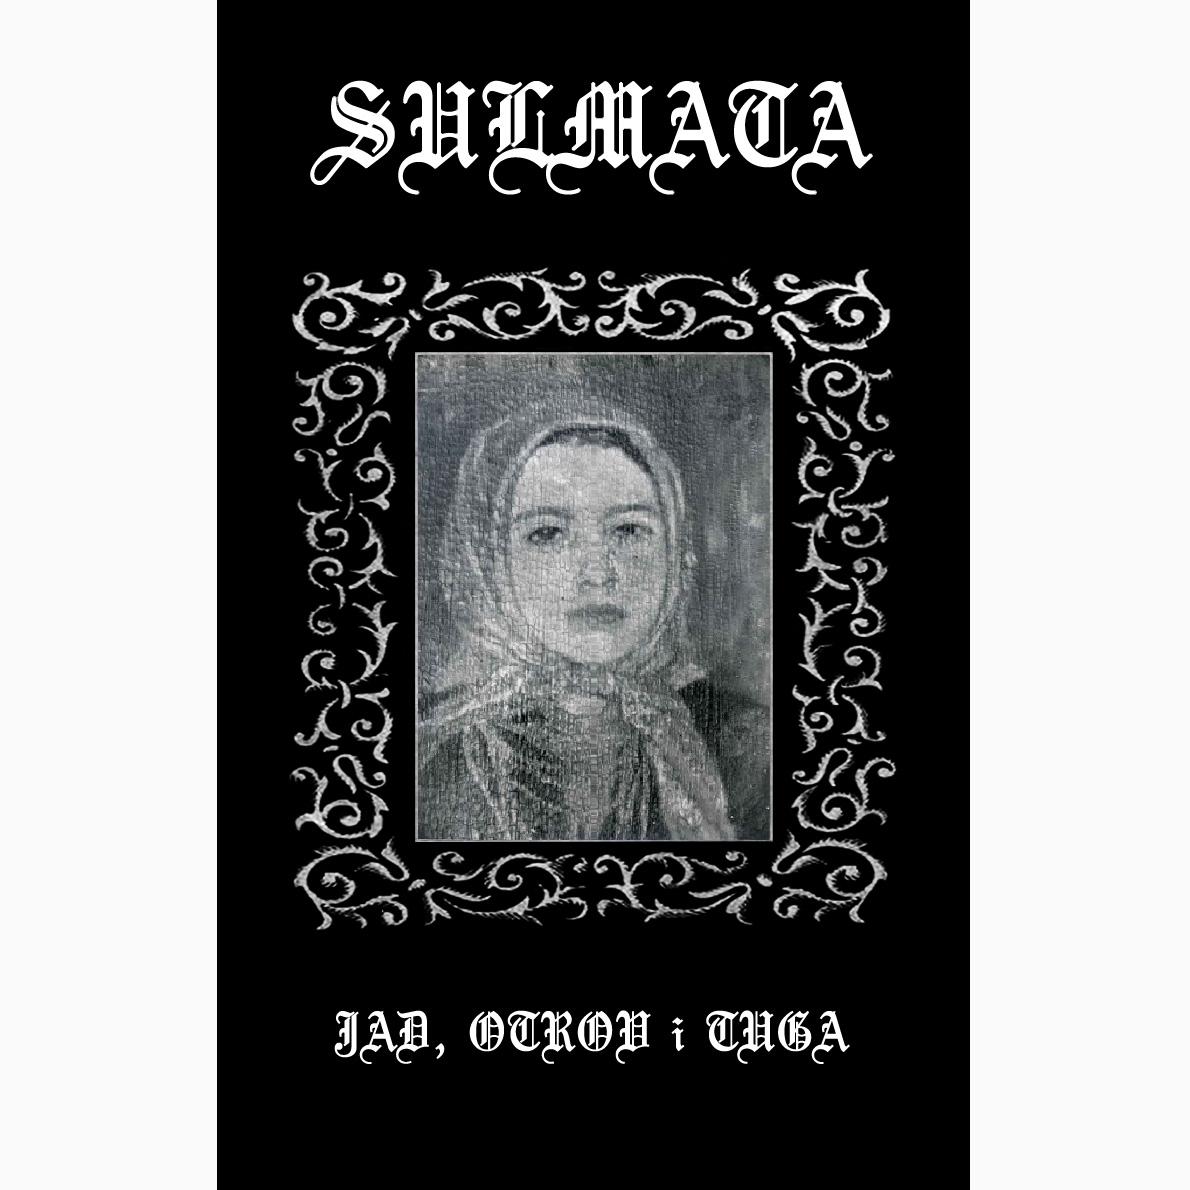 SULMATA - Jad, otrov i tuga